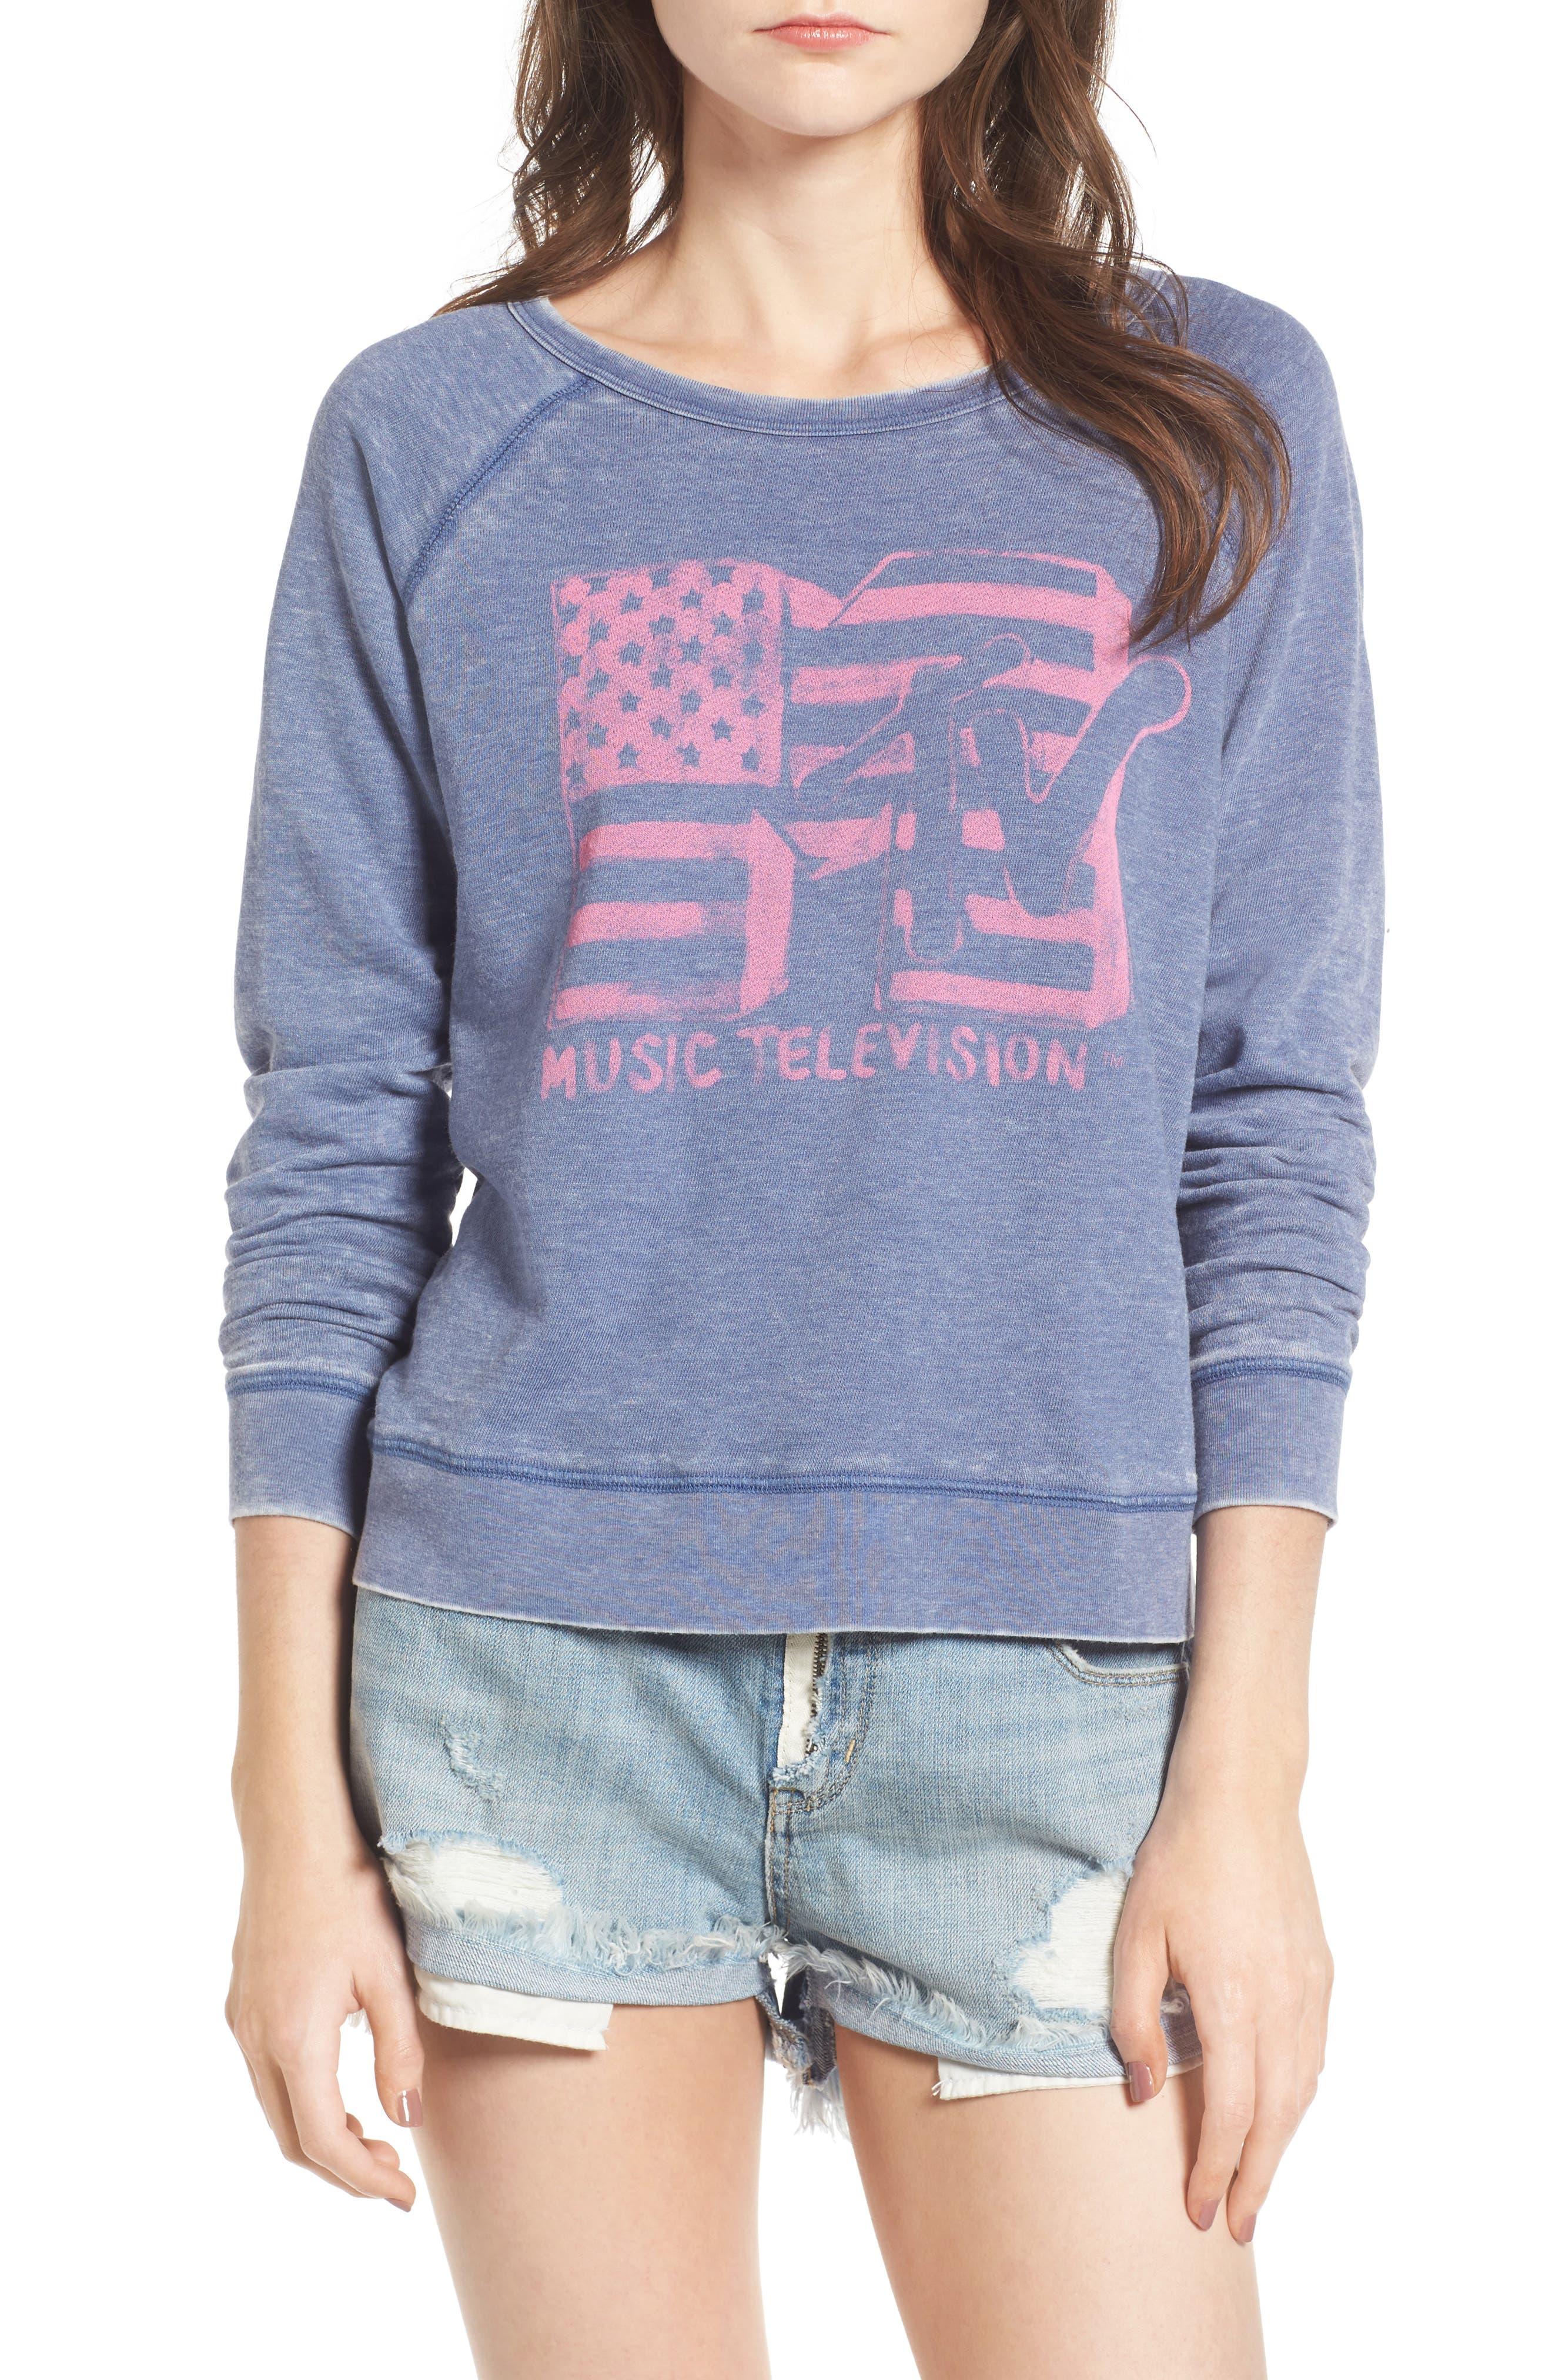 Junk Food MTV Sweatshirt